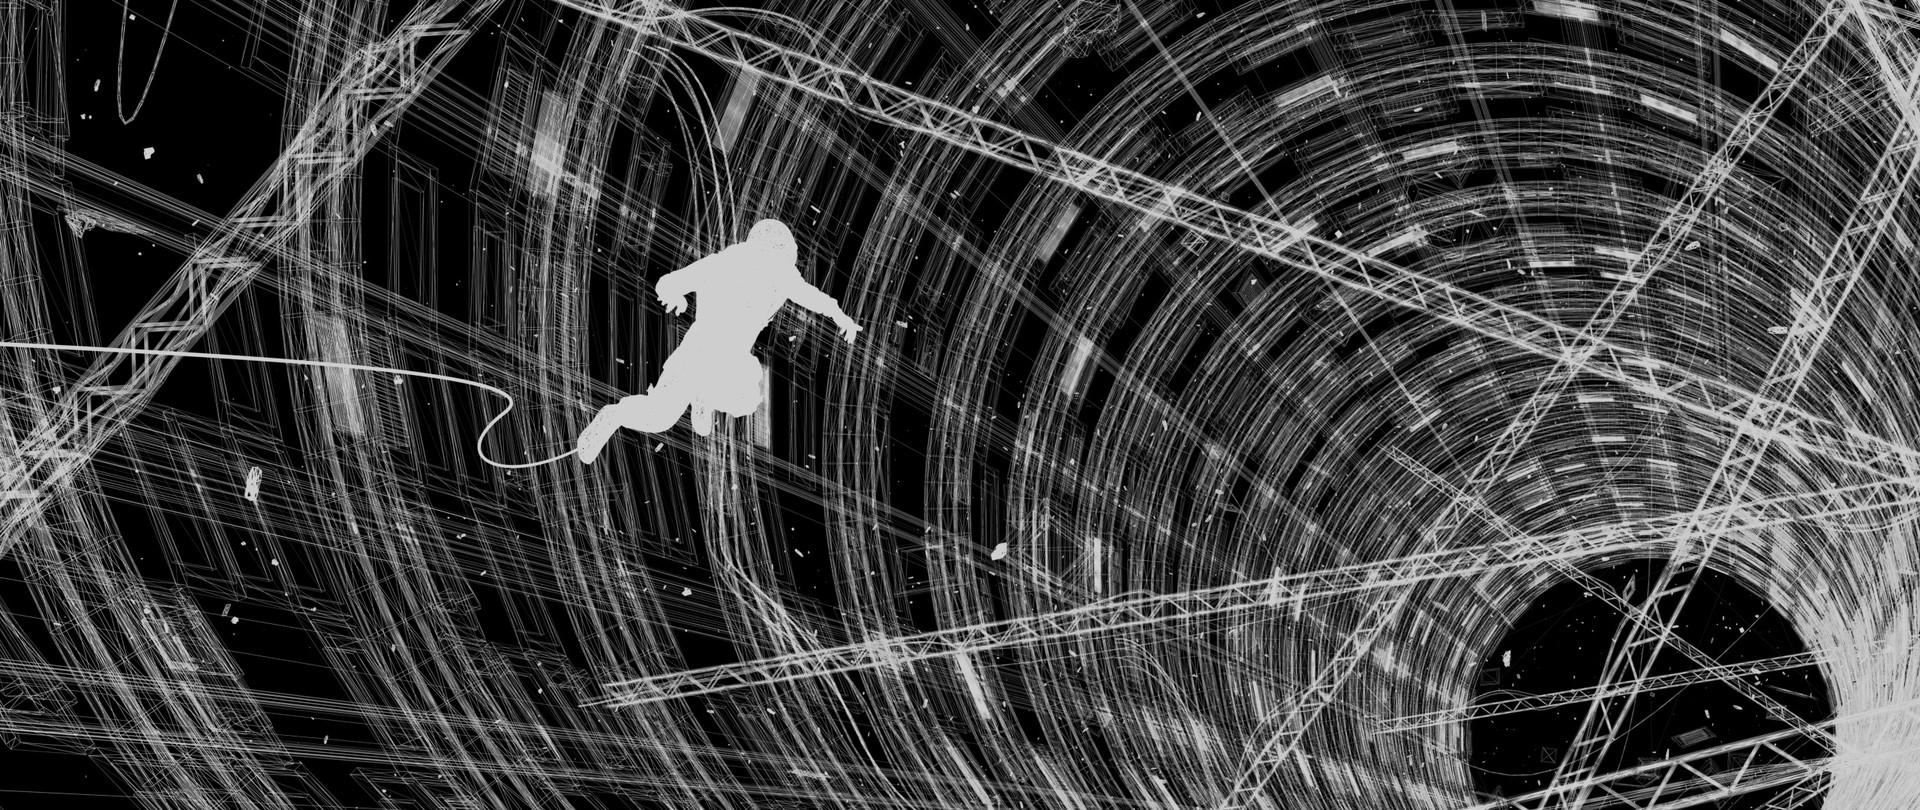 Andre mueller 20180906 weeklies astronaut wireframe